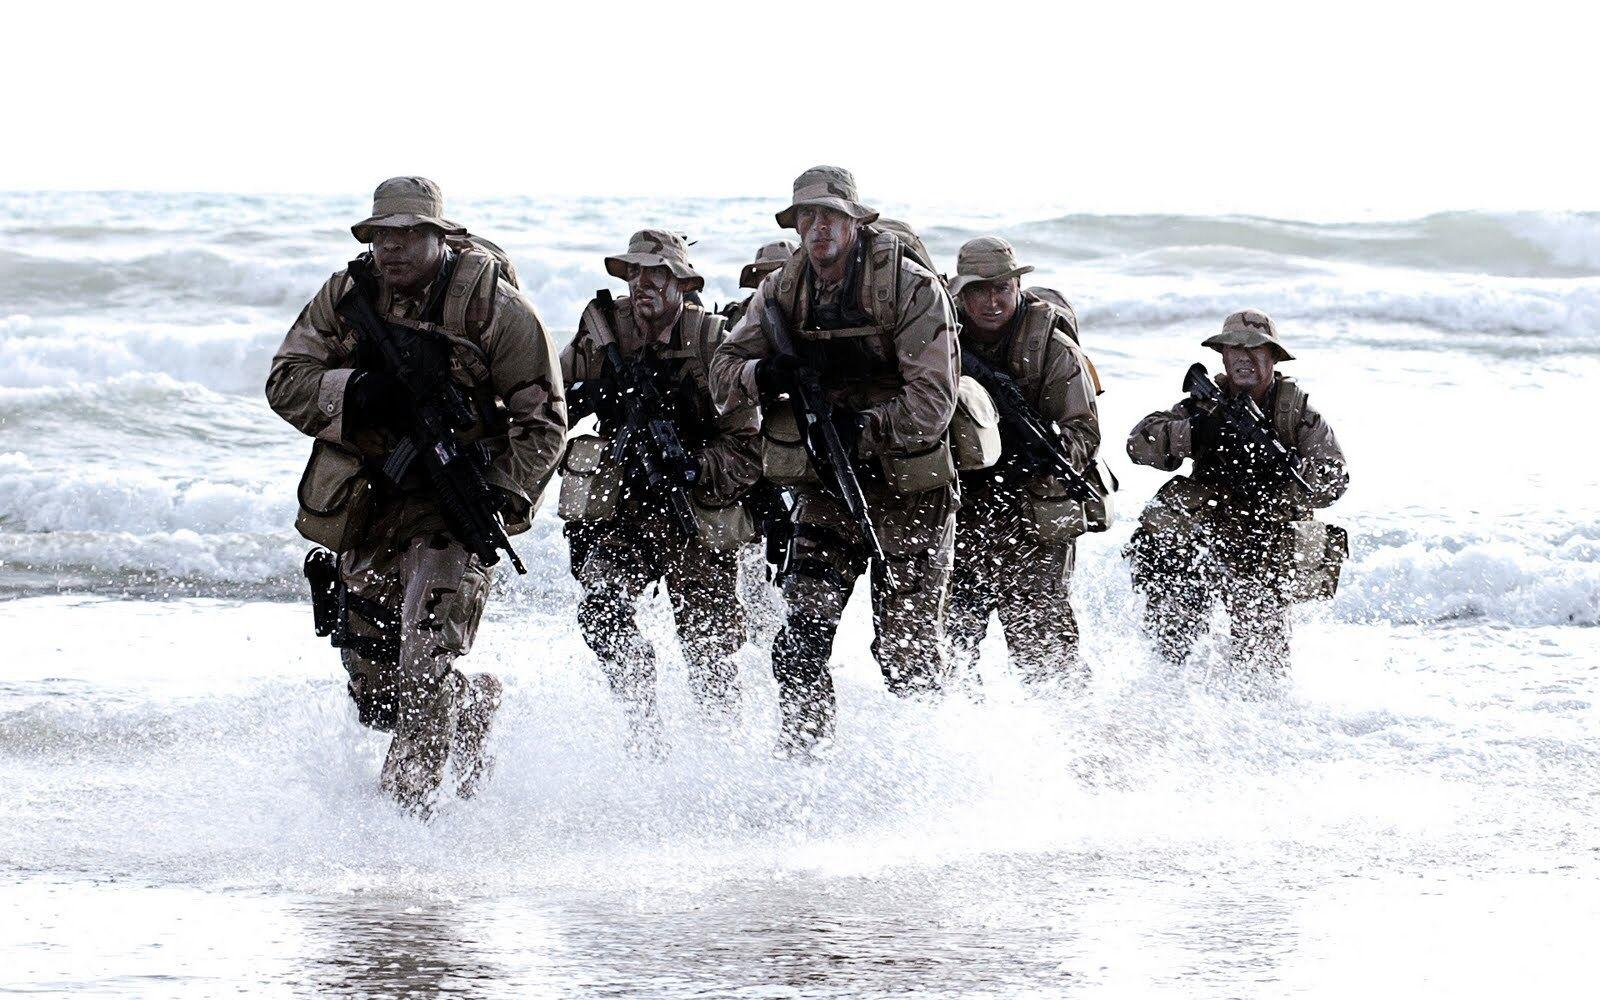 Iphone Navy Seal Wallpaper: Navy Seal Wallpaper, US Navy Seals Wallpapers